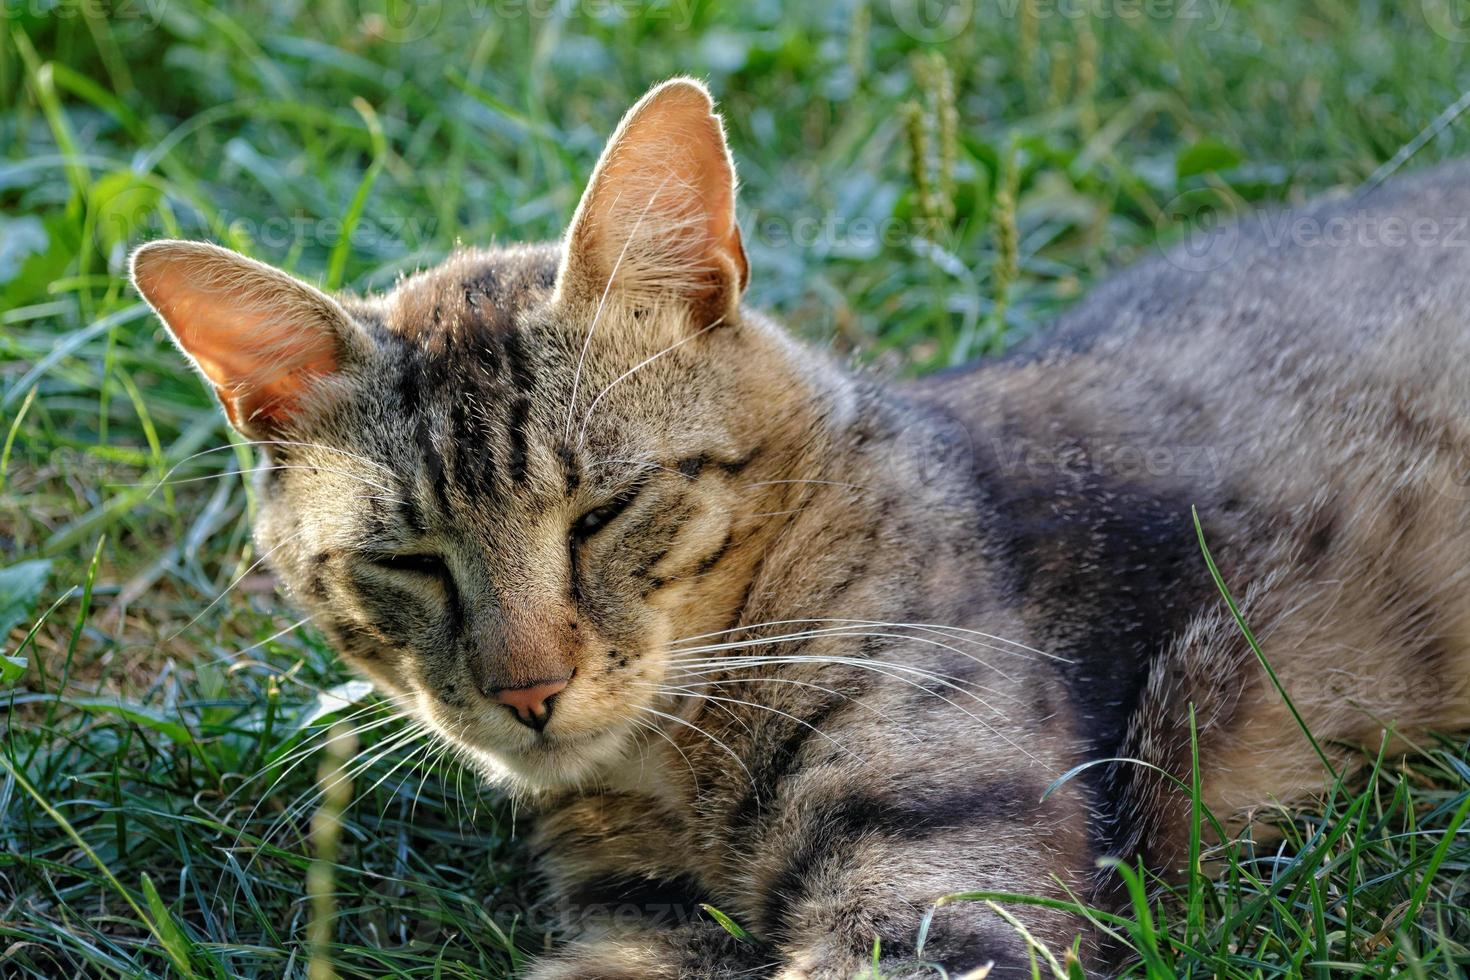 Napping tomcat photo